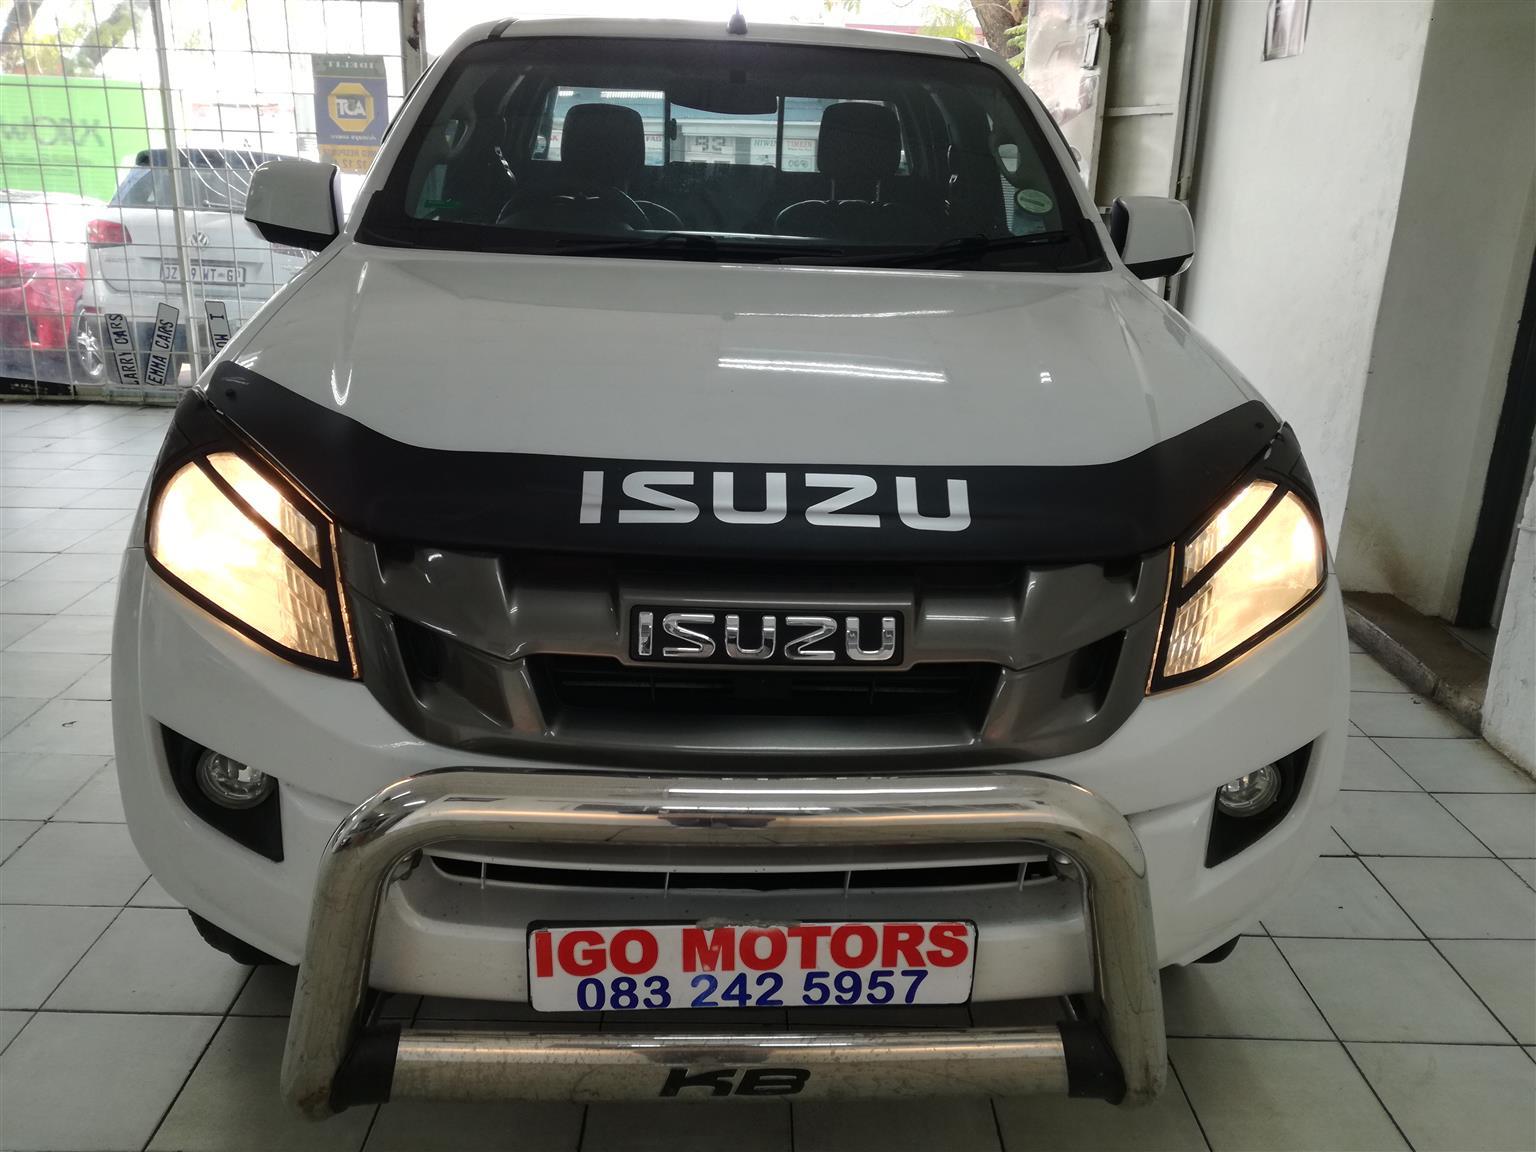 2015 Isuzu KB250D-Teq Extended Cab Mechanically perfect